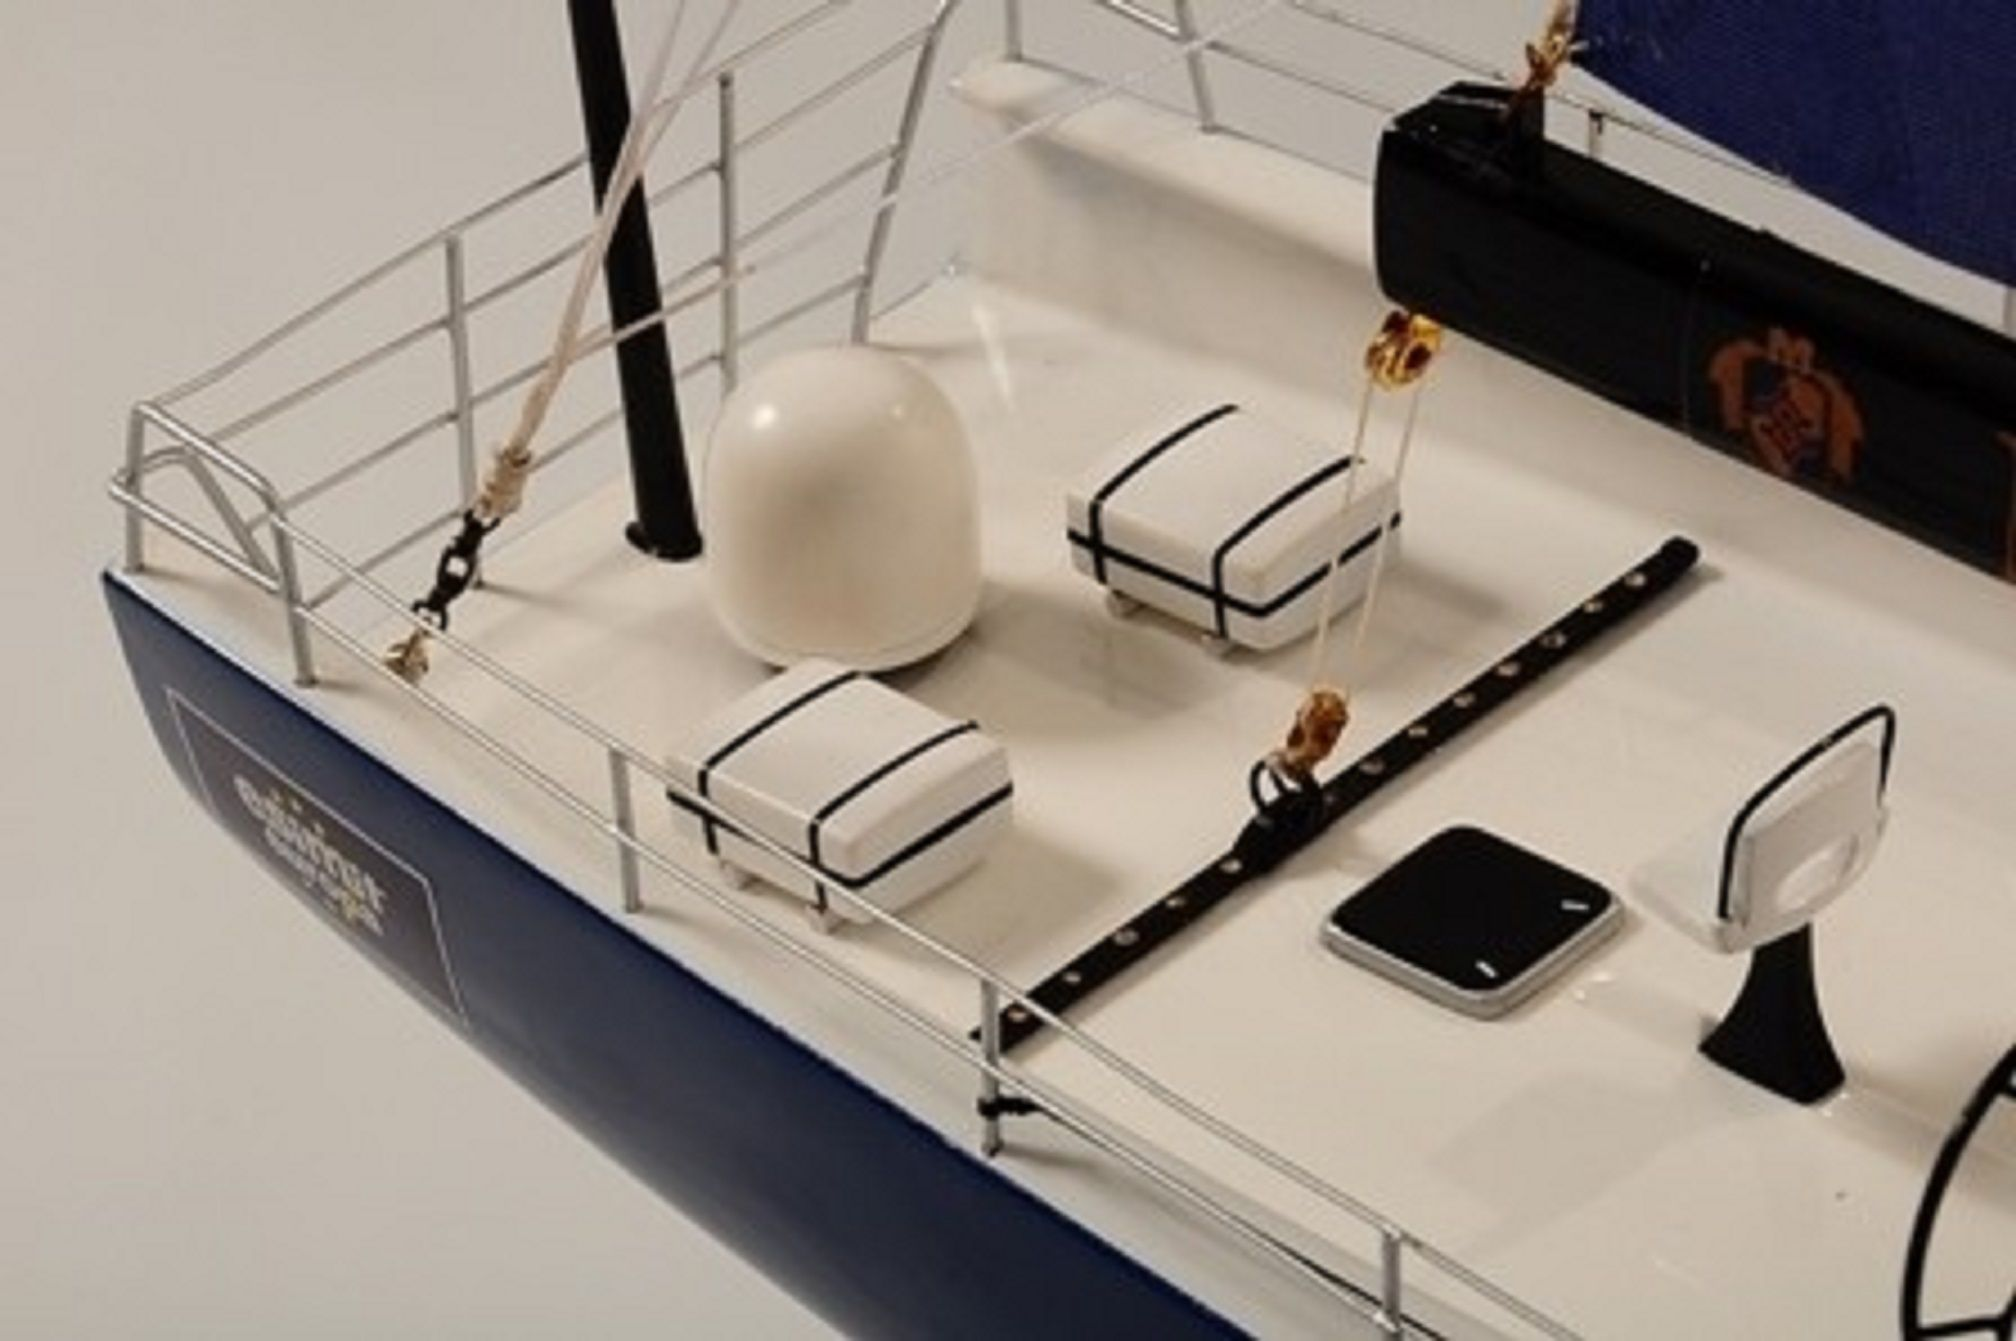 Supermaxi Model Yacht